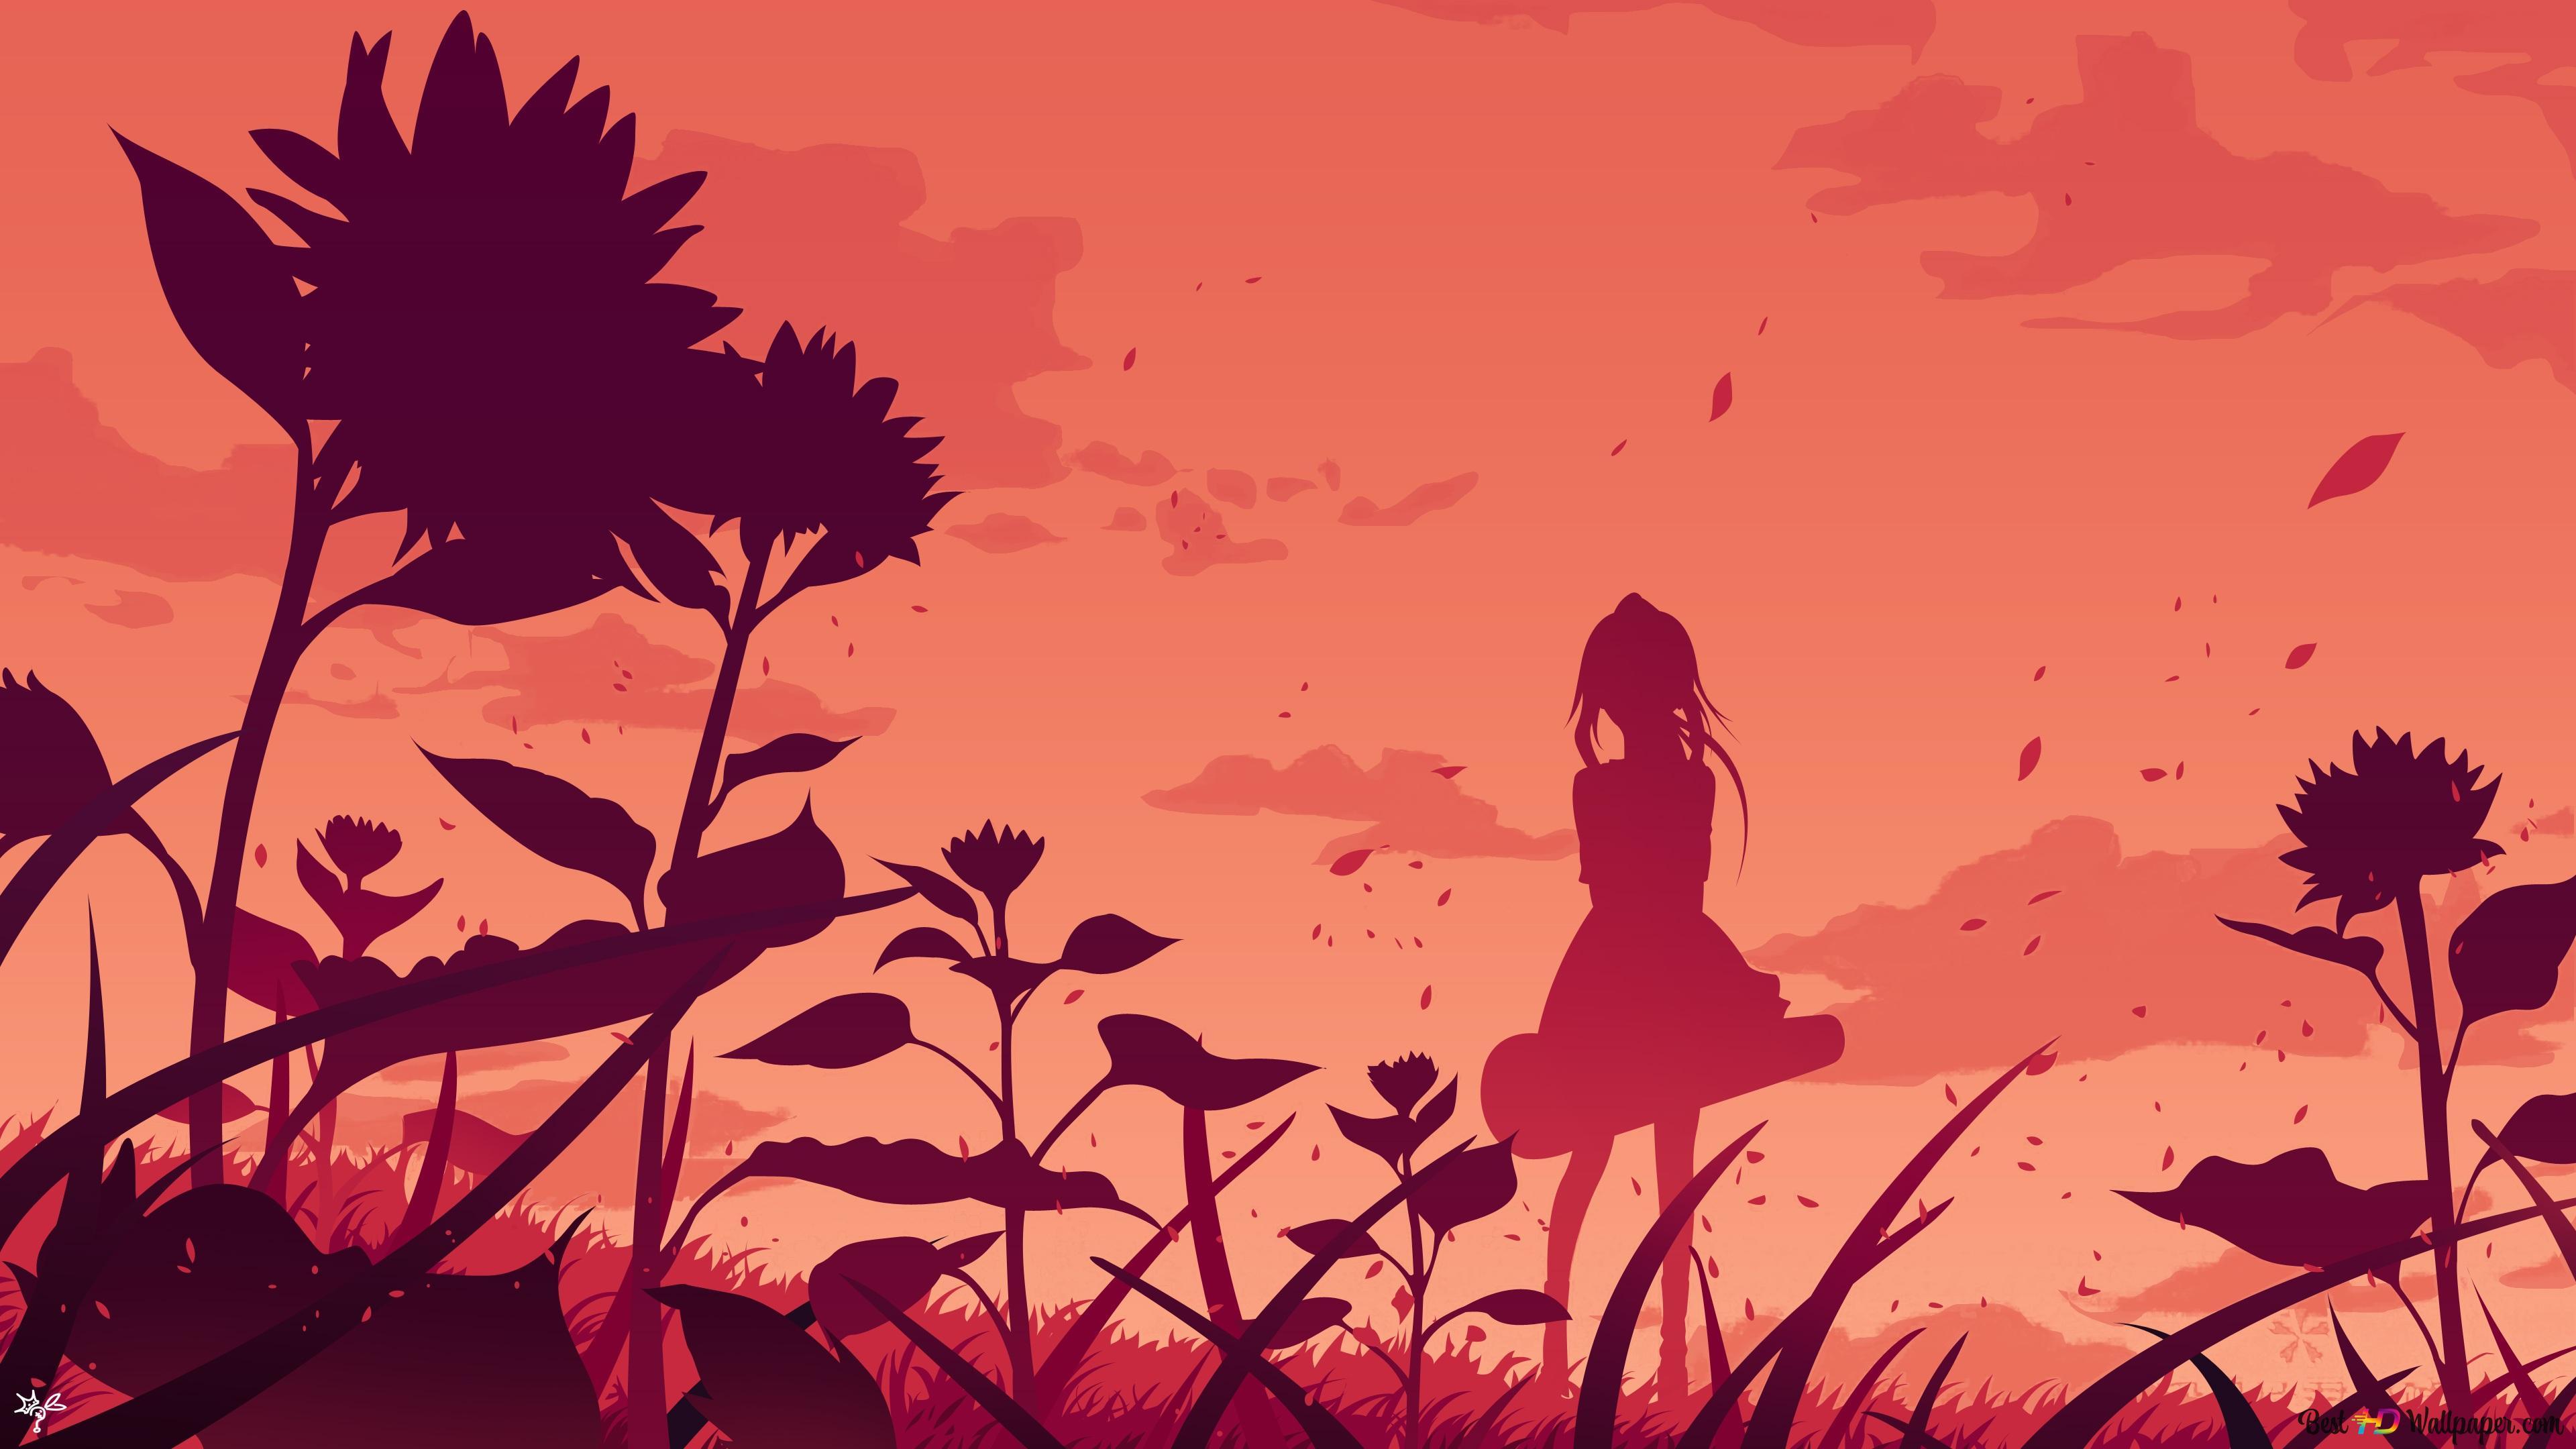 Your Lie In April Kaori Miyazono 4k Hd Wallpaper Download